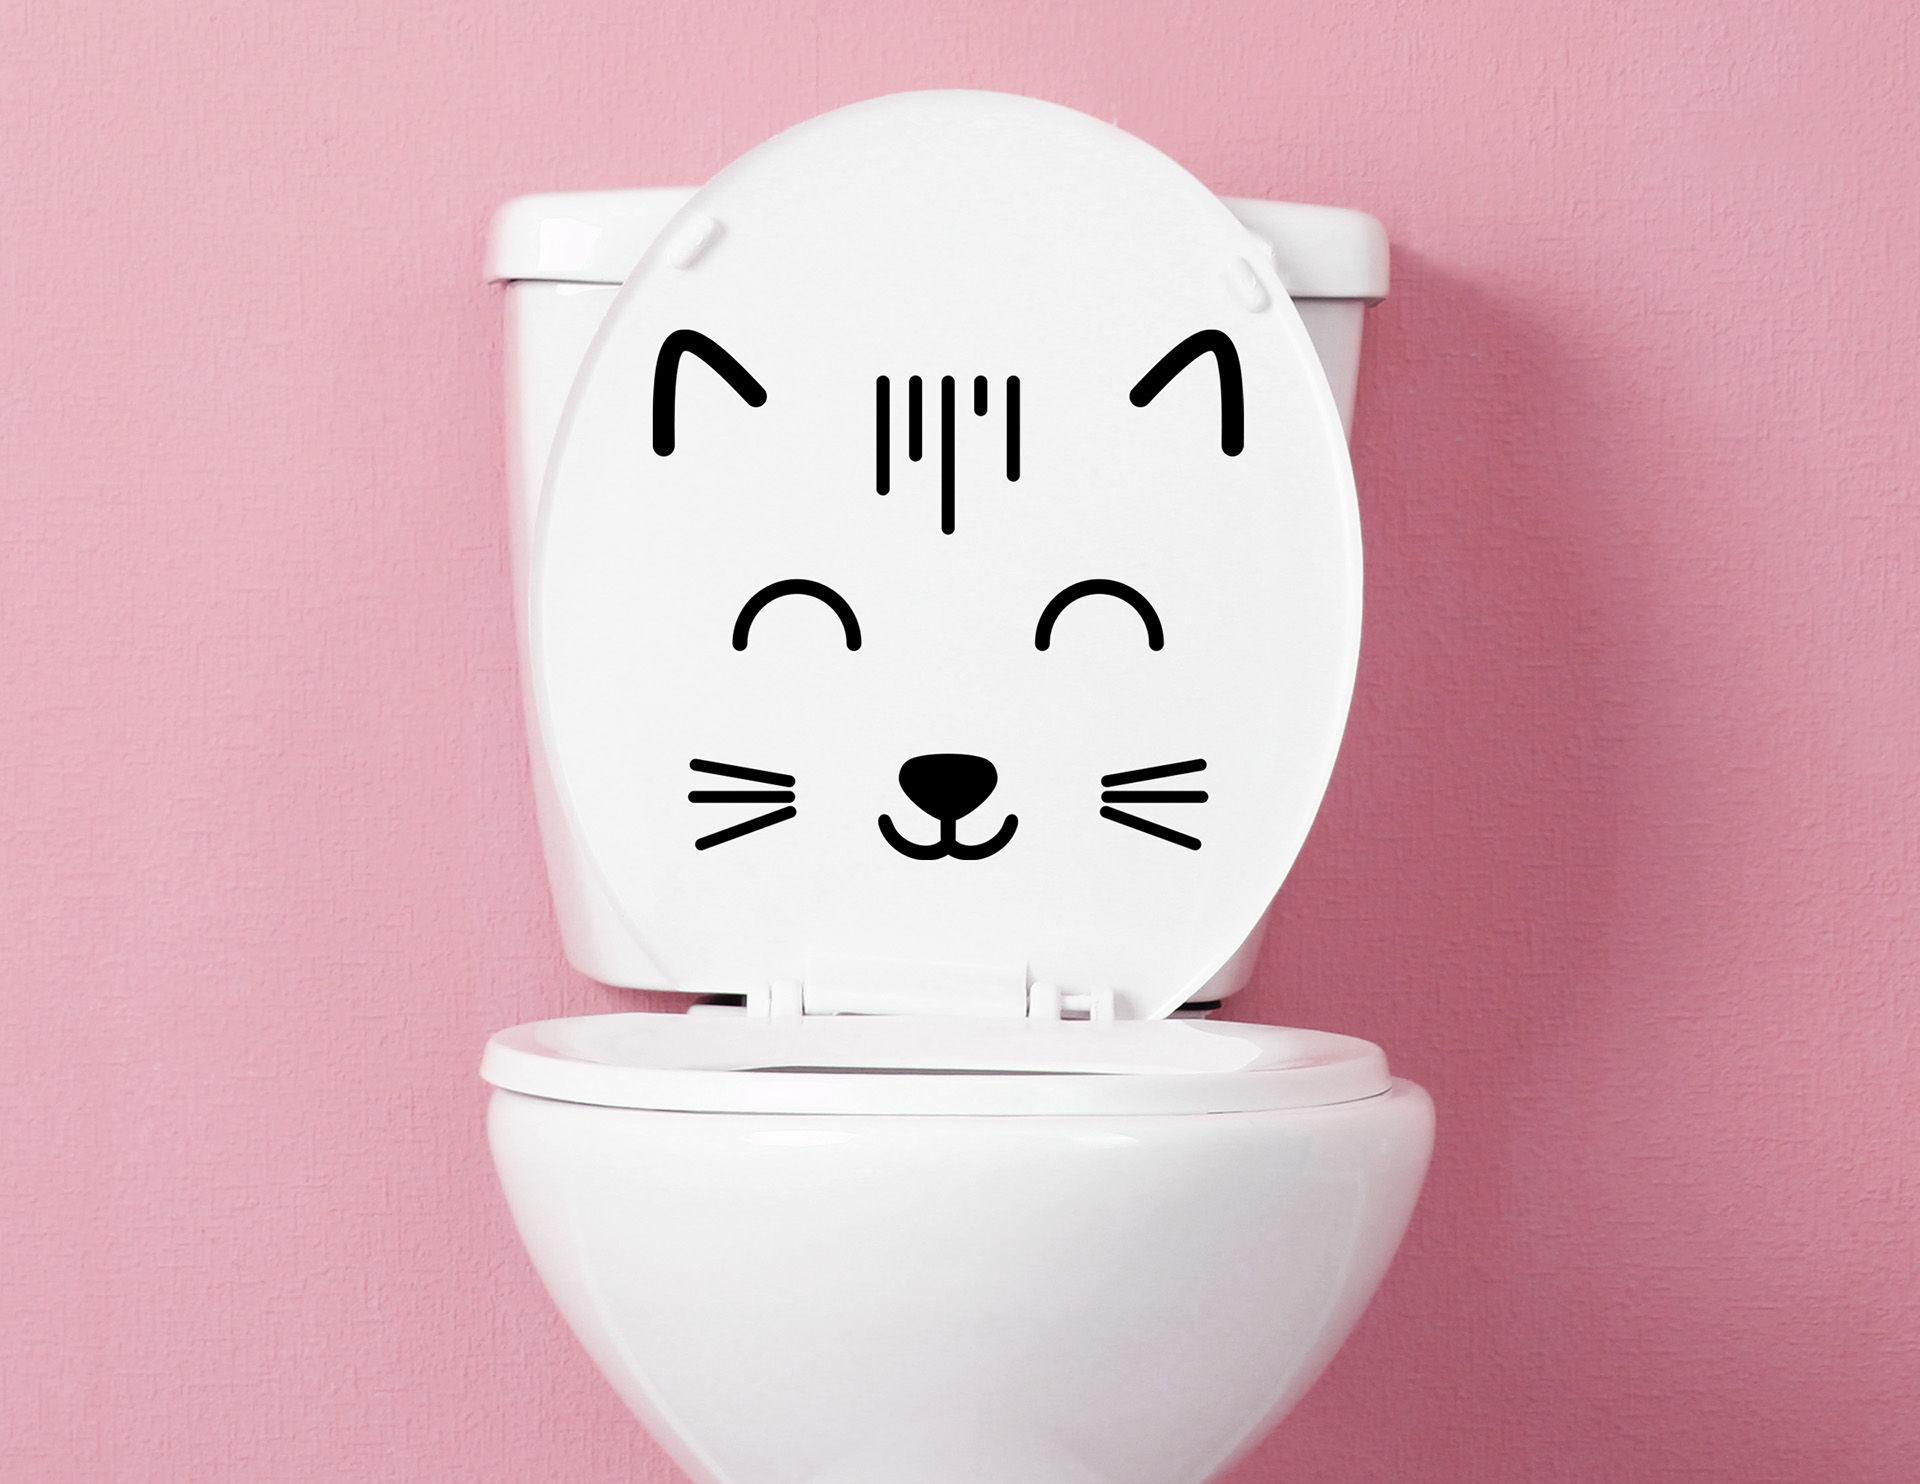 Carlo - lustiger WC-Aufkleber für Kinder